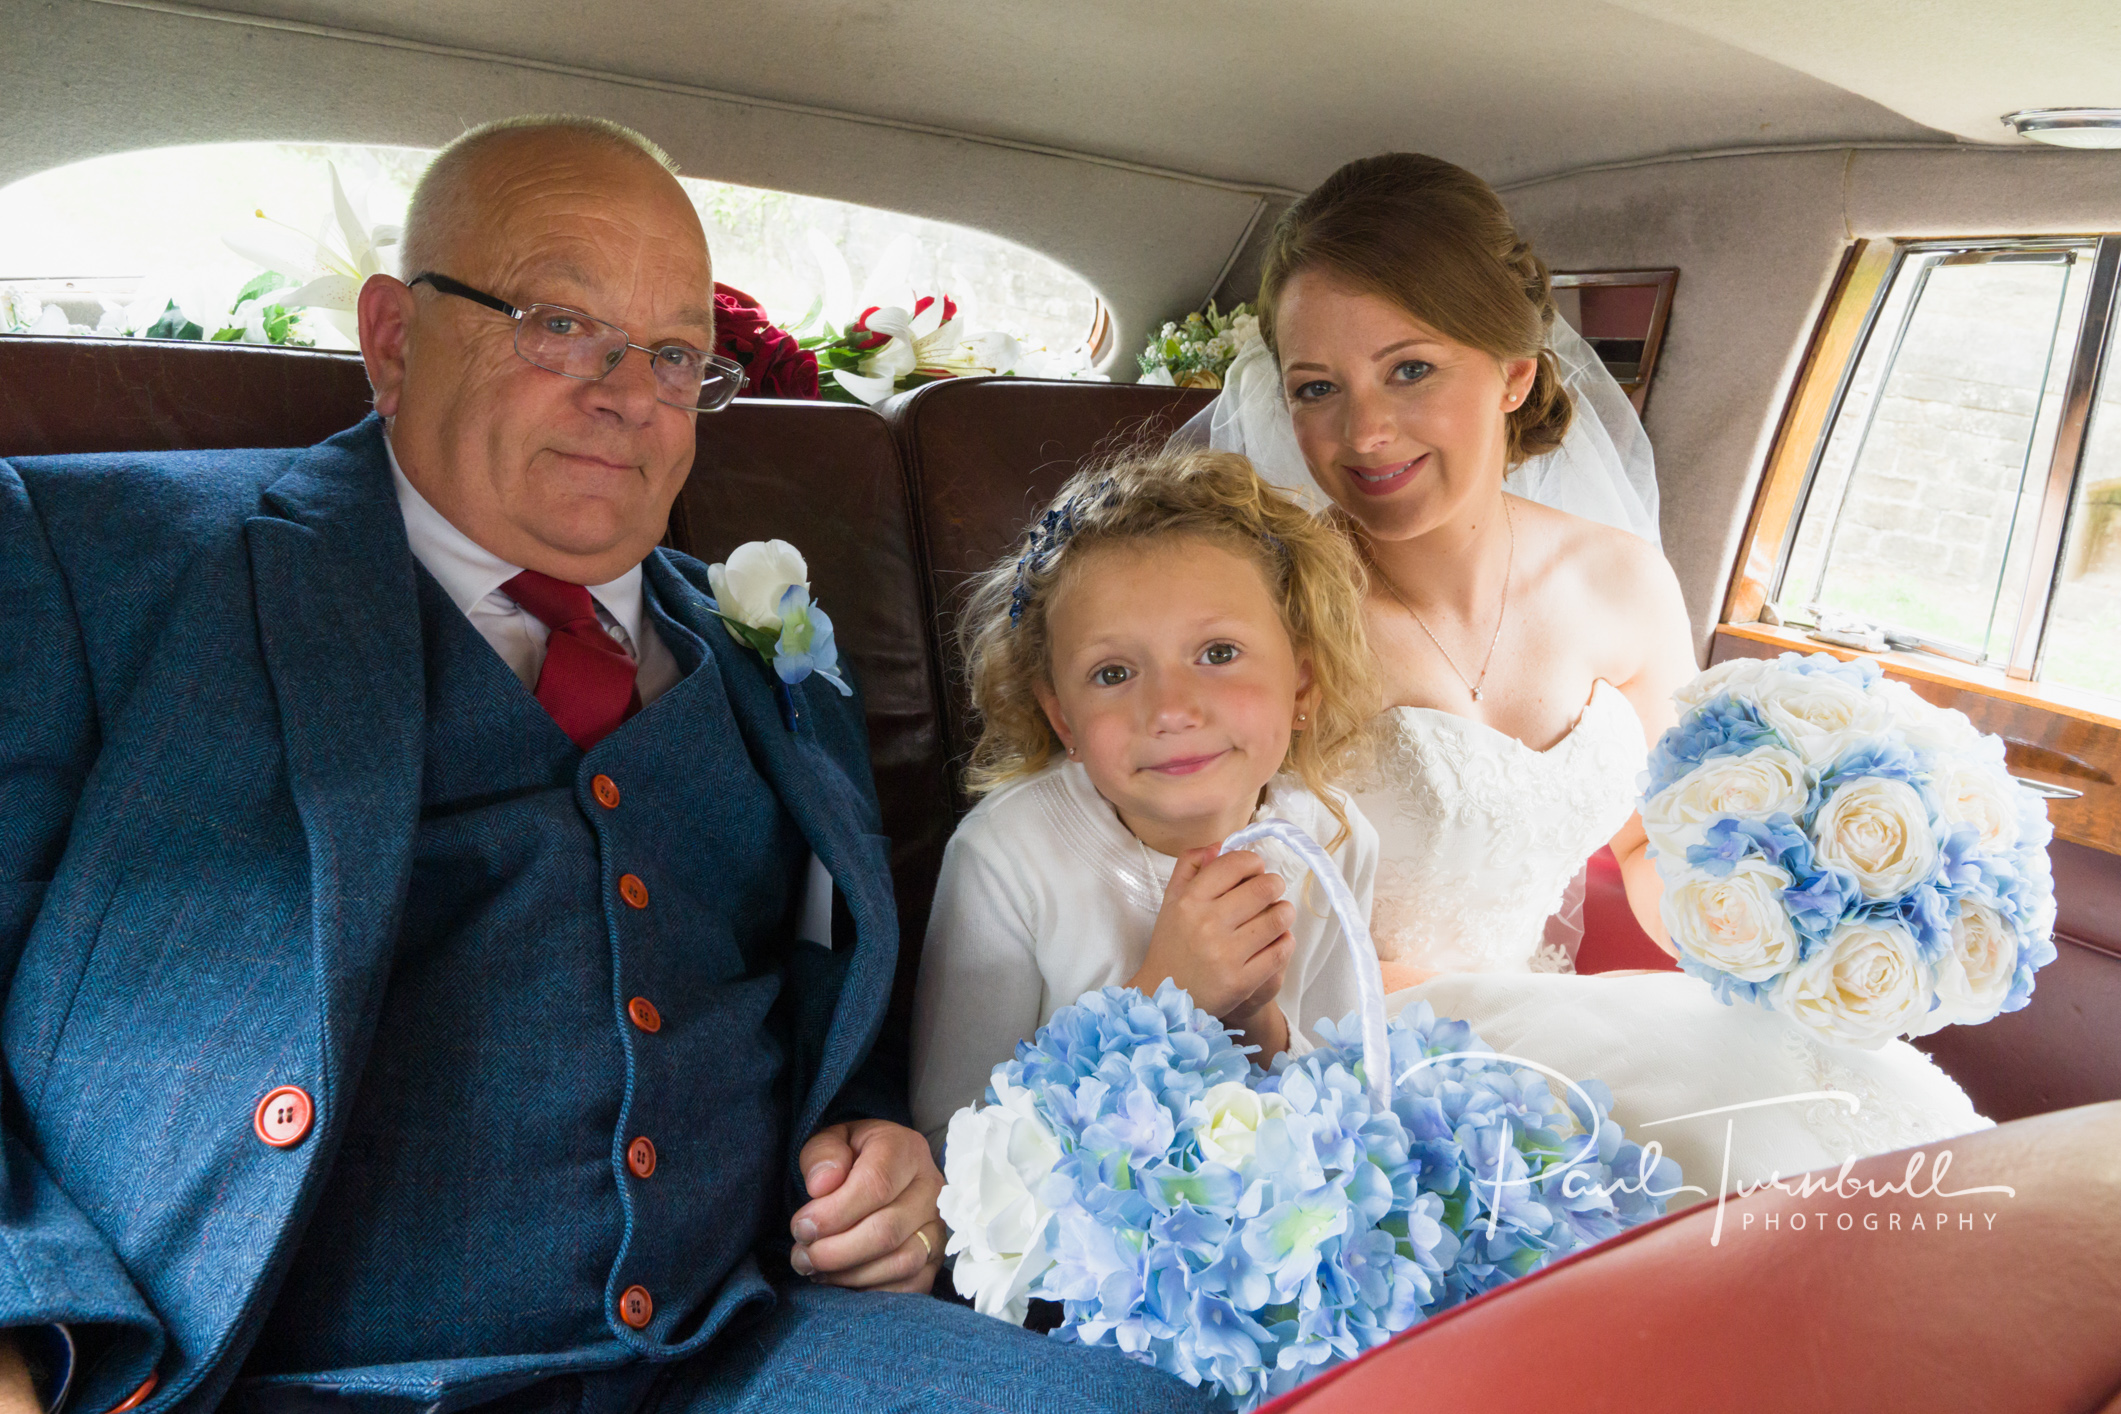 wedding-photographer-south-dalton-walkington-yorkshire-emma-james-029.jpg